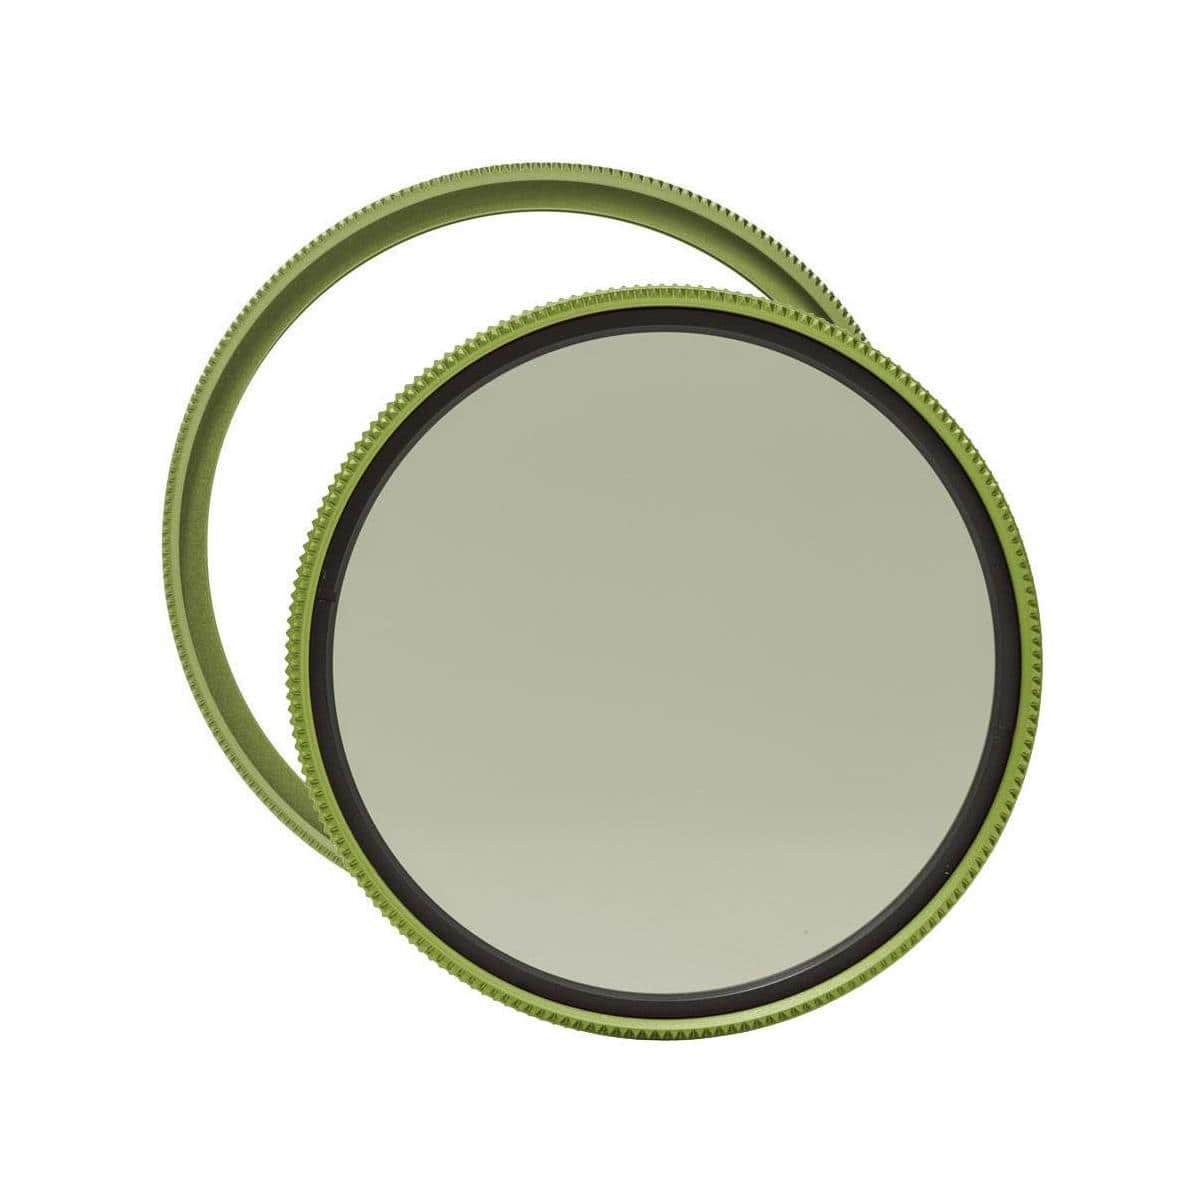 MeFOTO Filters: 58mm UV+Lens Protector & Circular Polarizer $12, or 67mm $14 + free s/h